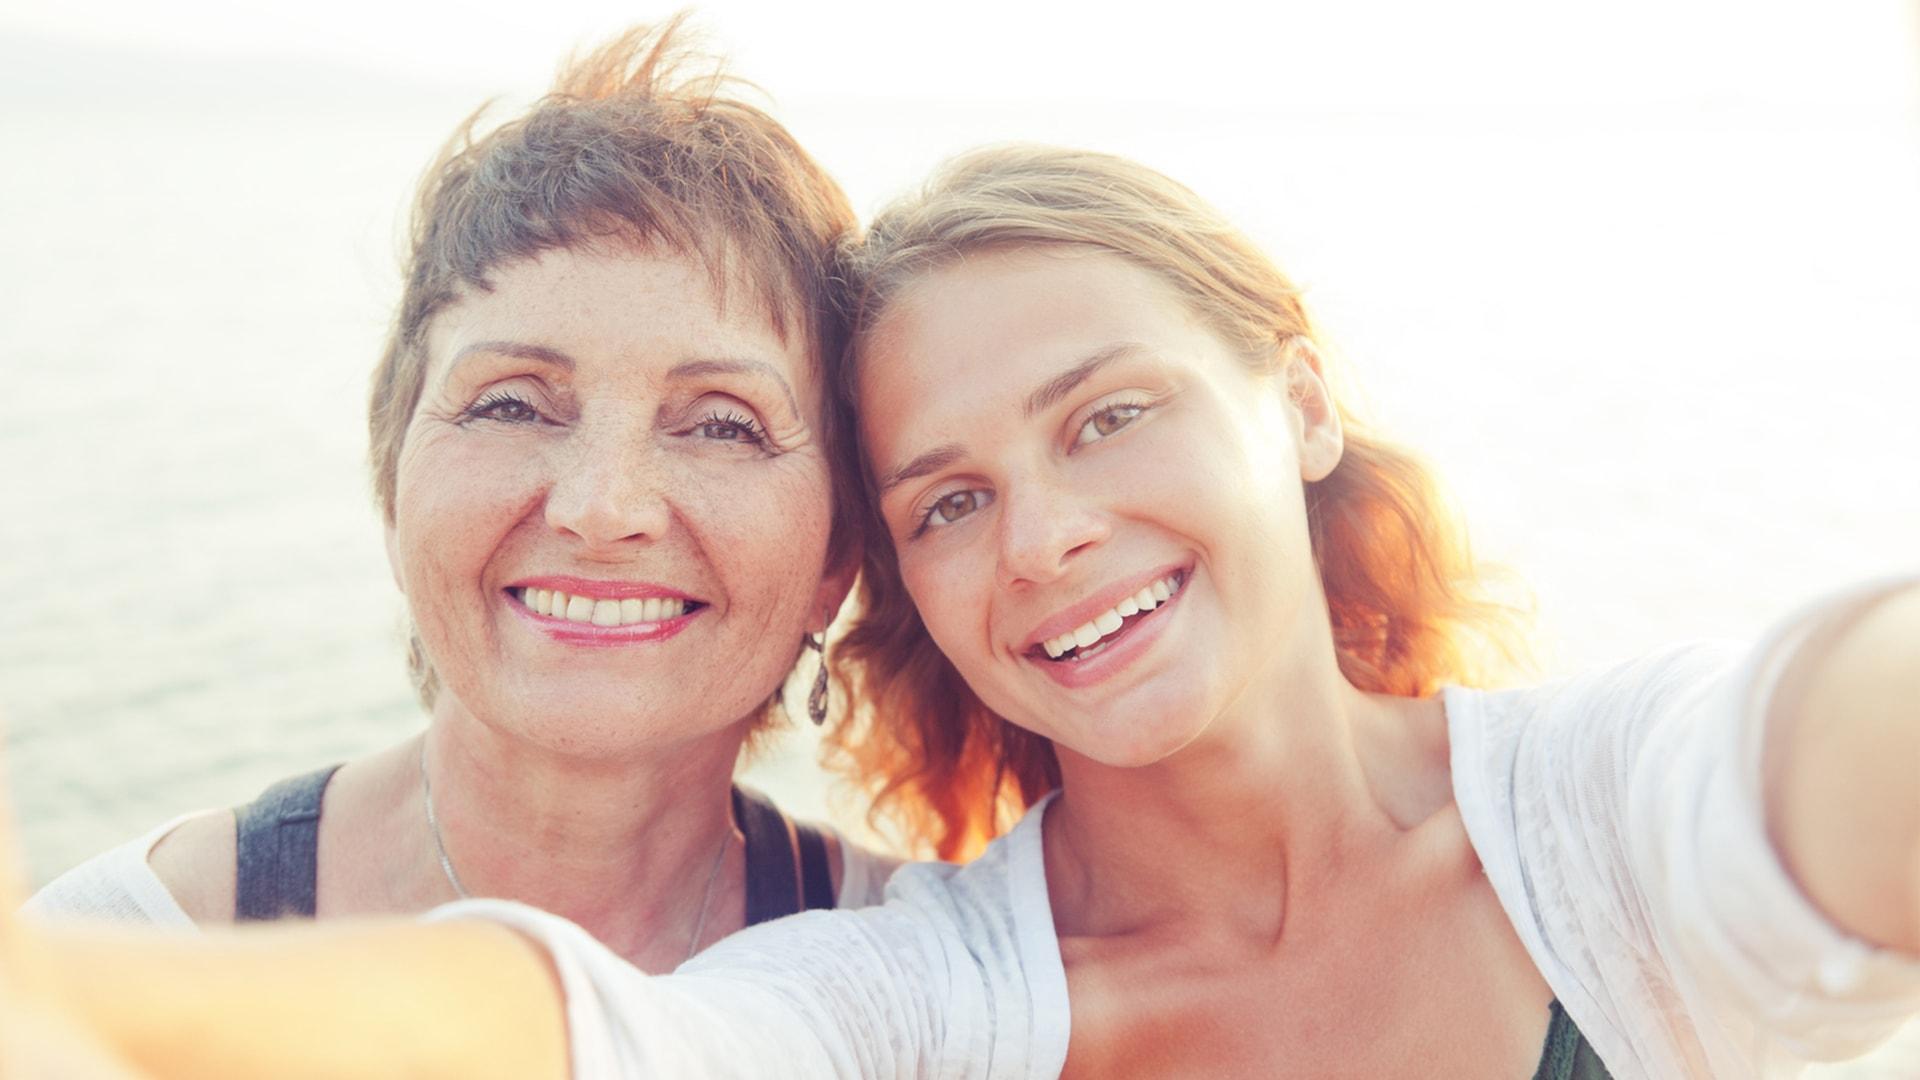 Endodontie Rudow: Kommen Sie vorbei in Ihrer Zahnarztpraxis in Berlin Rudow